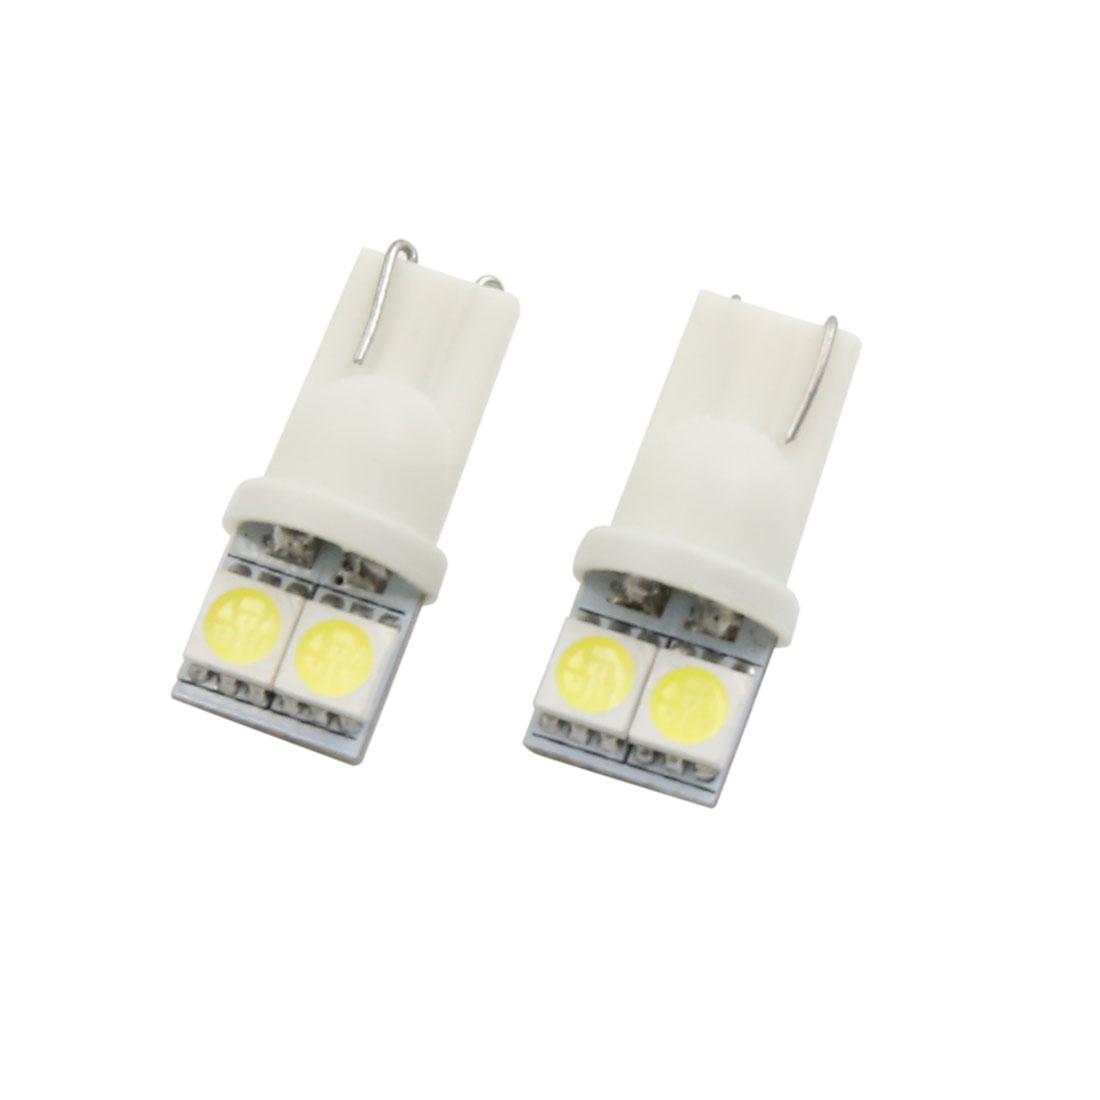 2pcs 0.4W 12V 5050 T10 6000K 20lm Power Car White LED Dashboard Panel Light Bulb